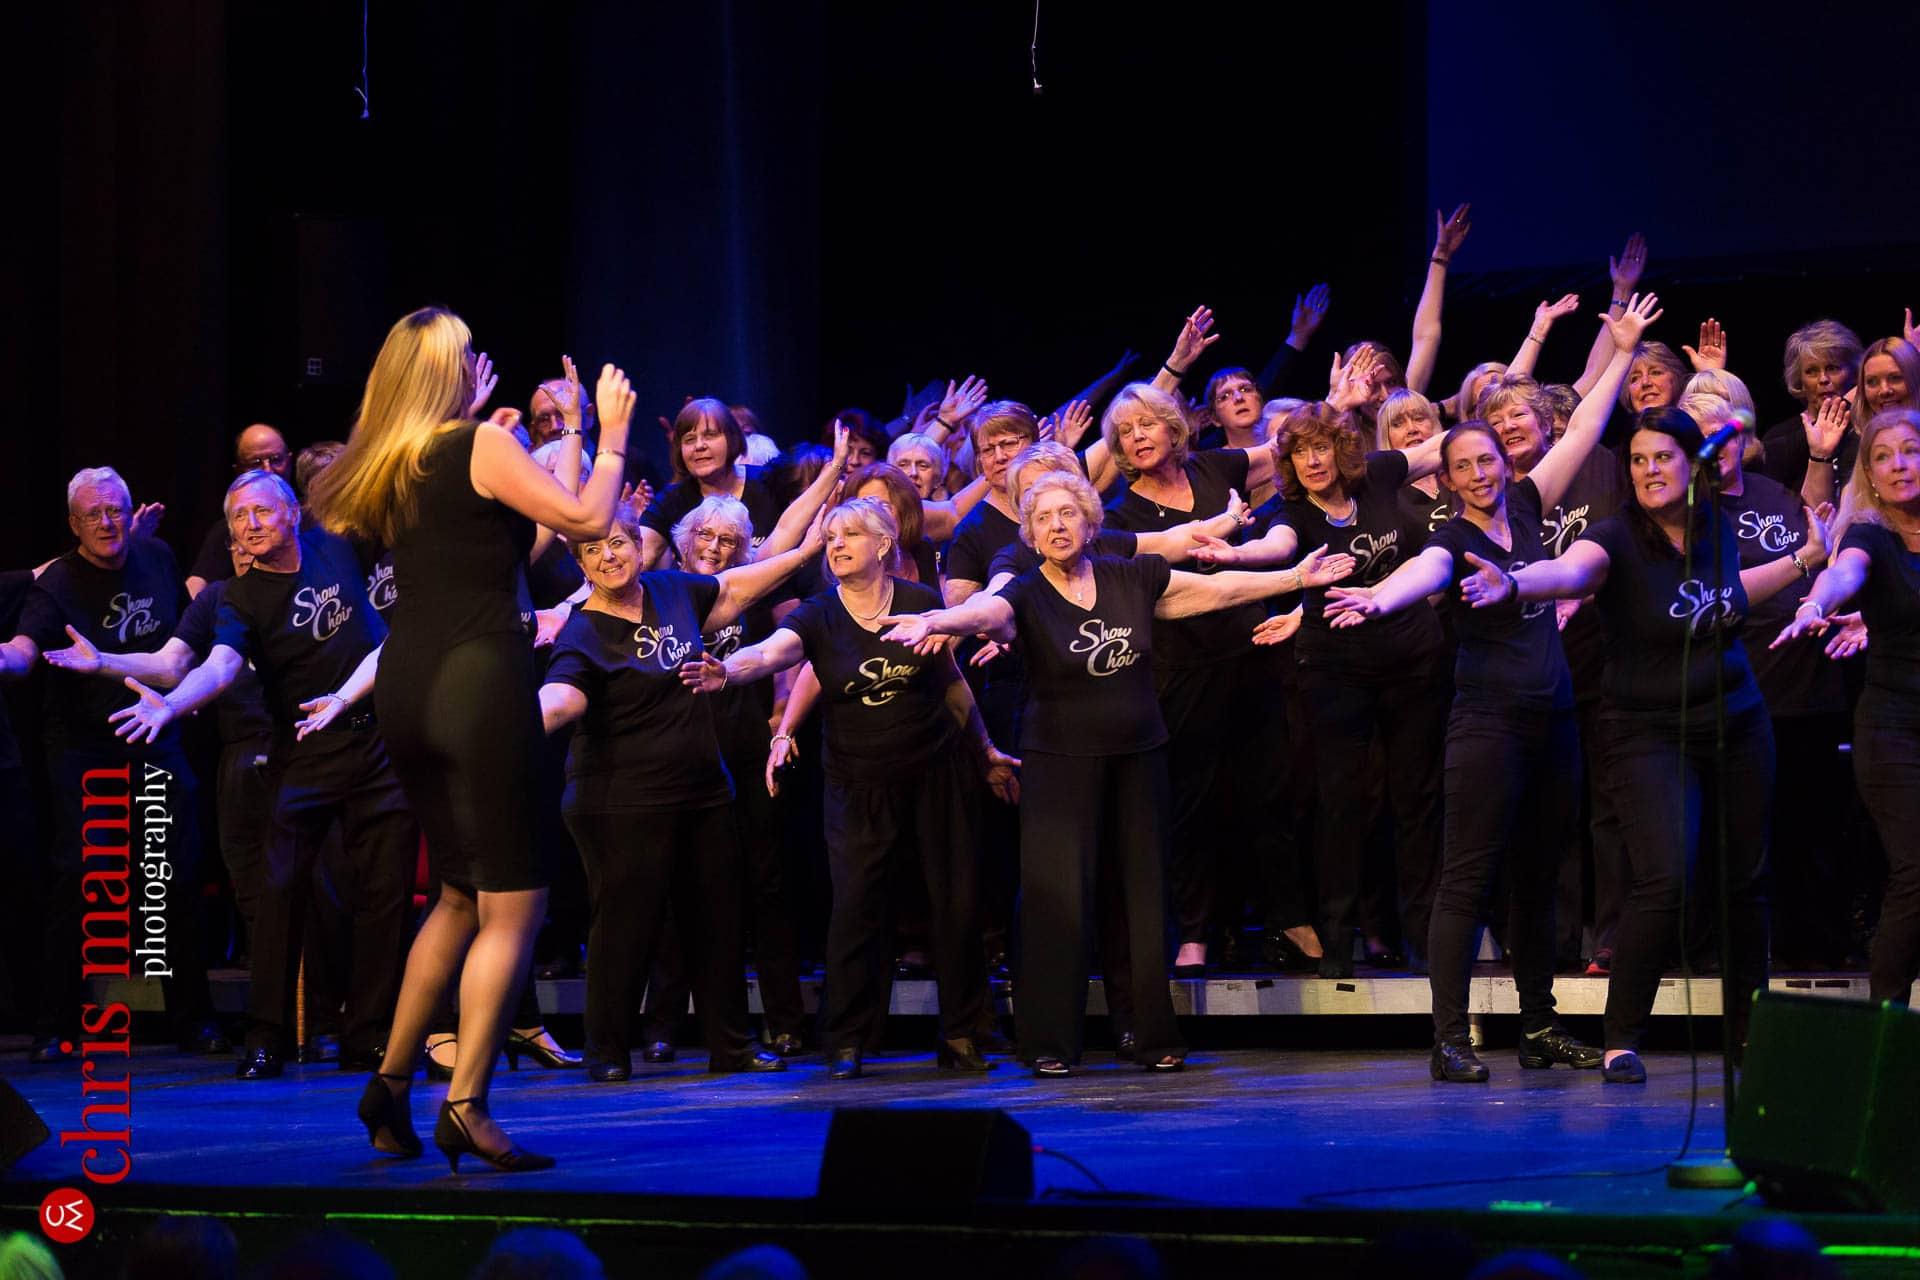 Choiroke-2016-concert-Dorking-Halls-085